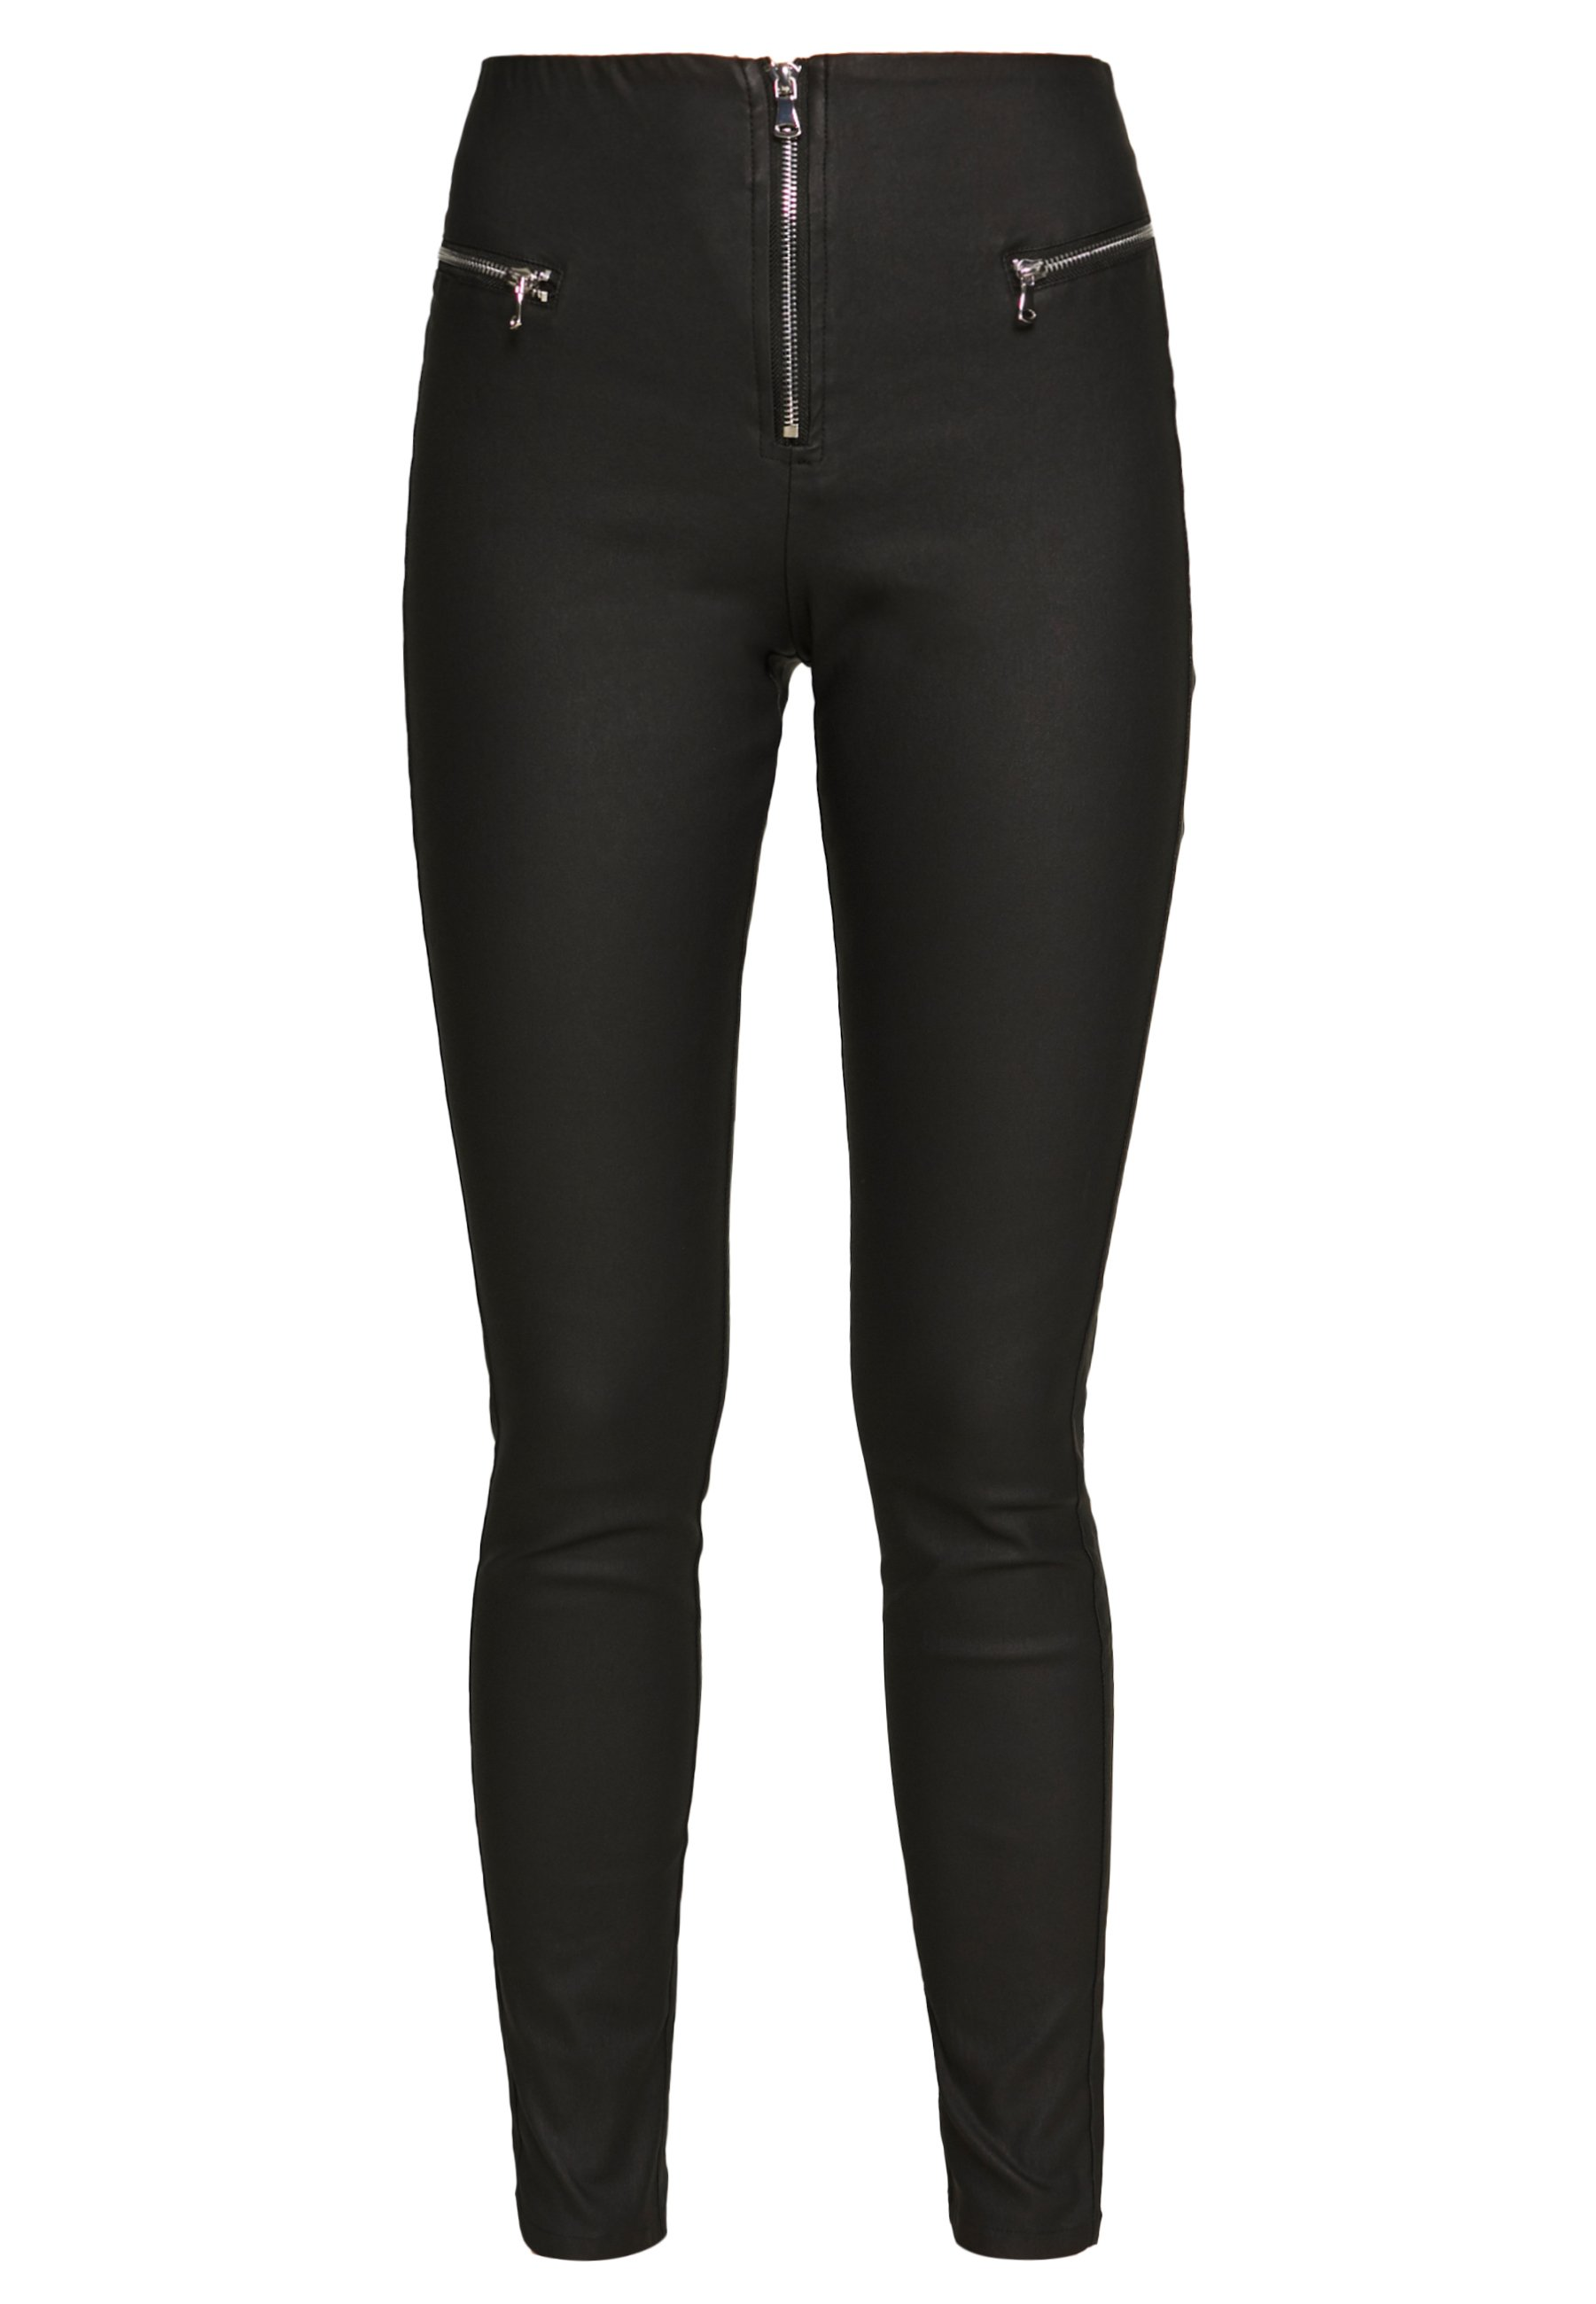 Tiger Mist Pearl Pant - Leggingsit Black